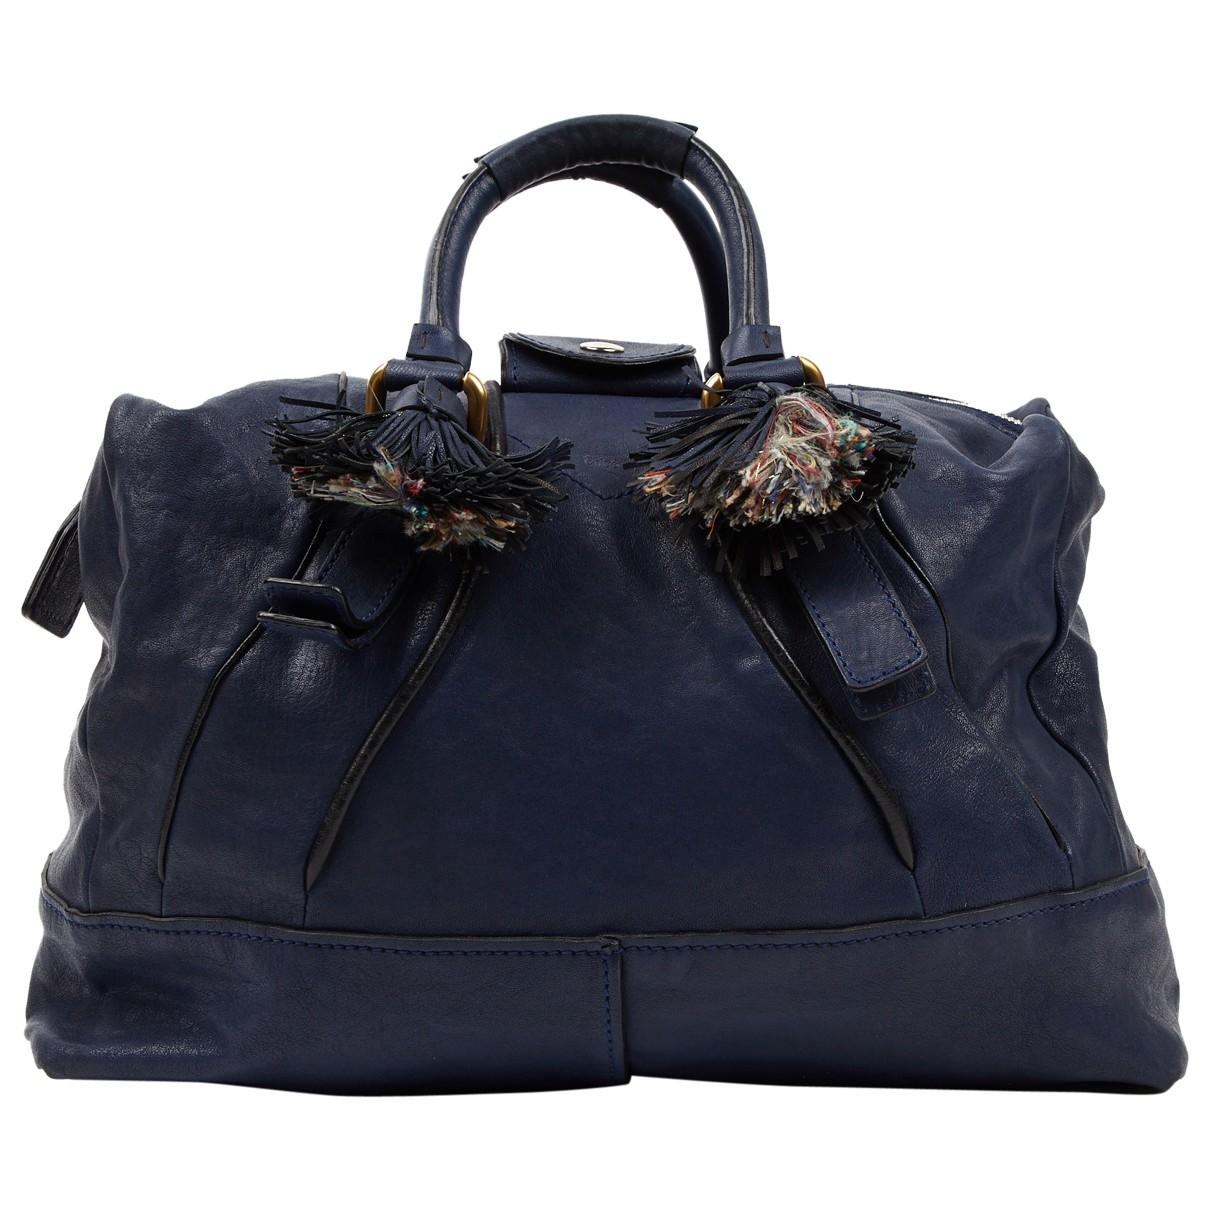 Chloé \N Navy Leather handbag for Women \N